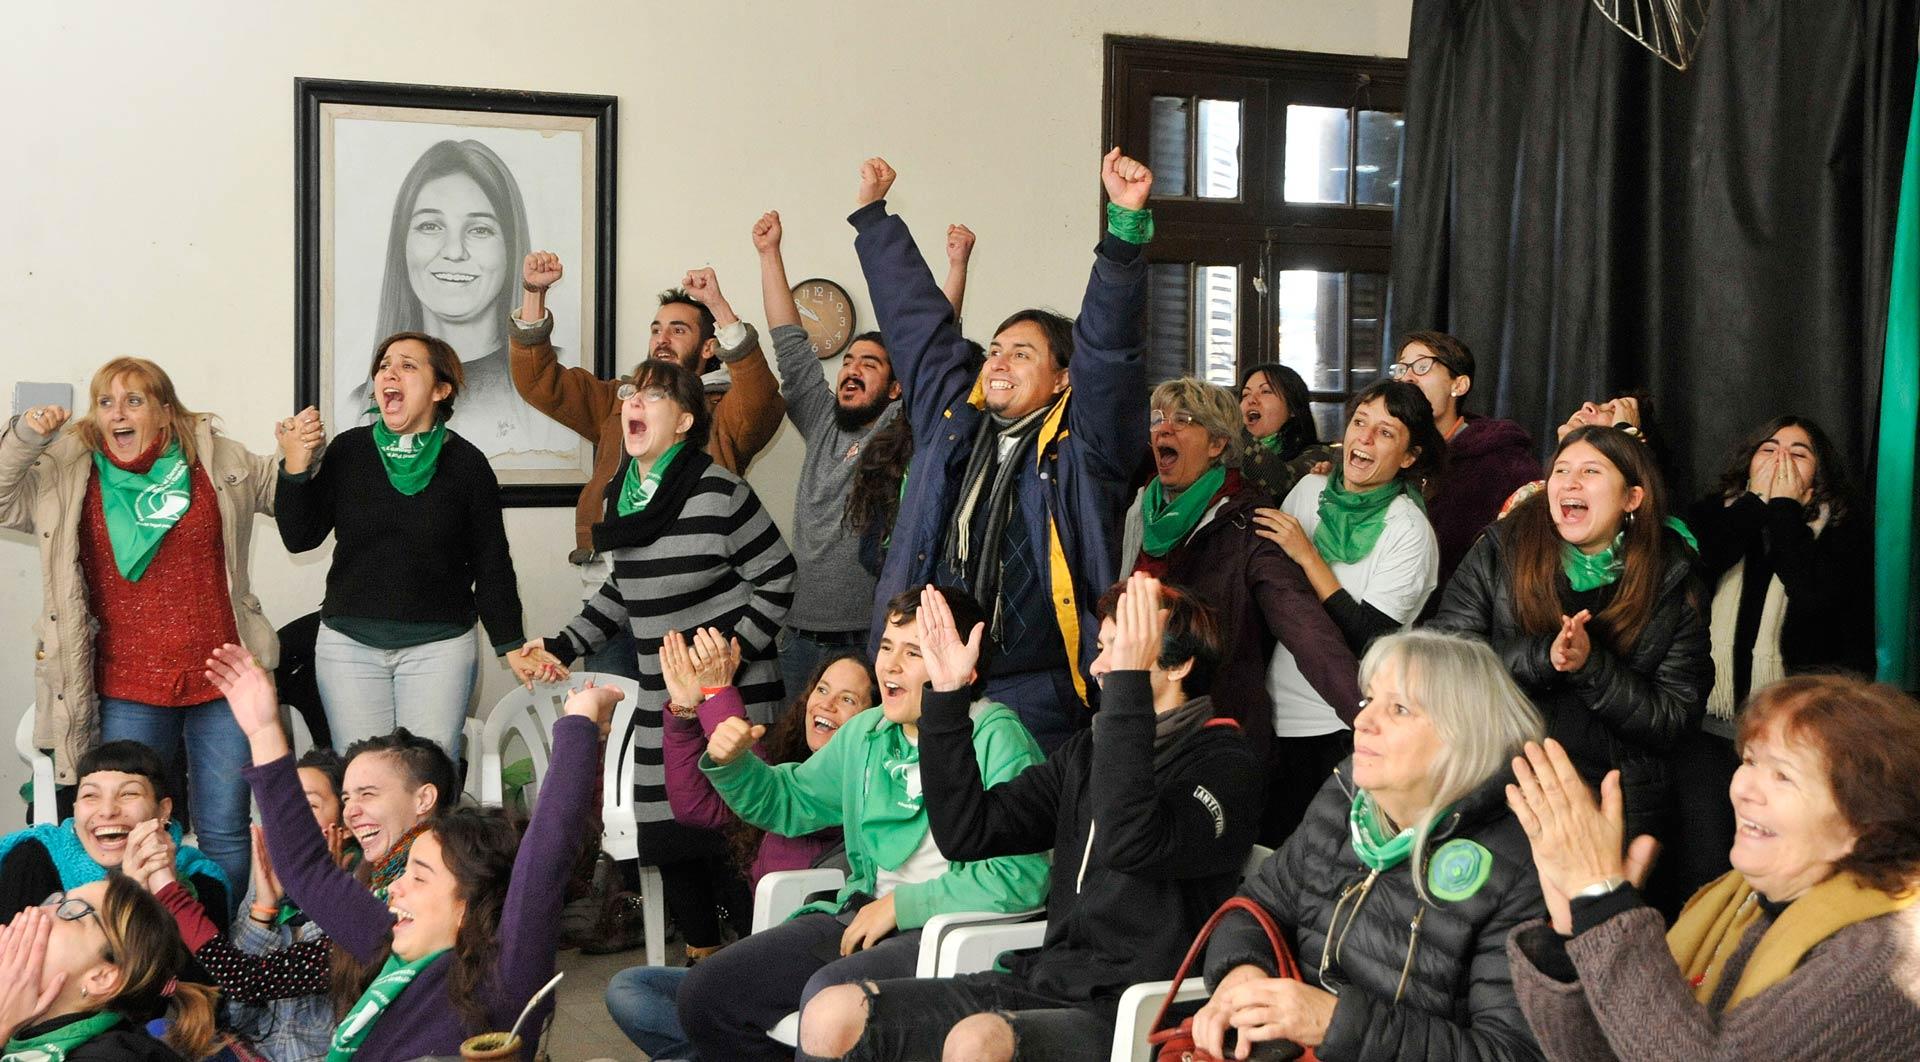 Momento del voto positivo a favor de la ley del Aborto Legal. Lugar Sipren